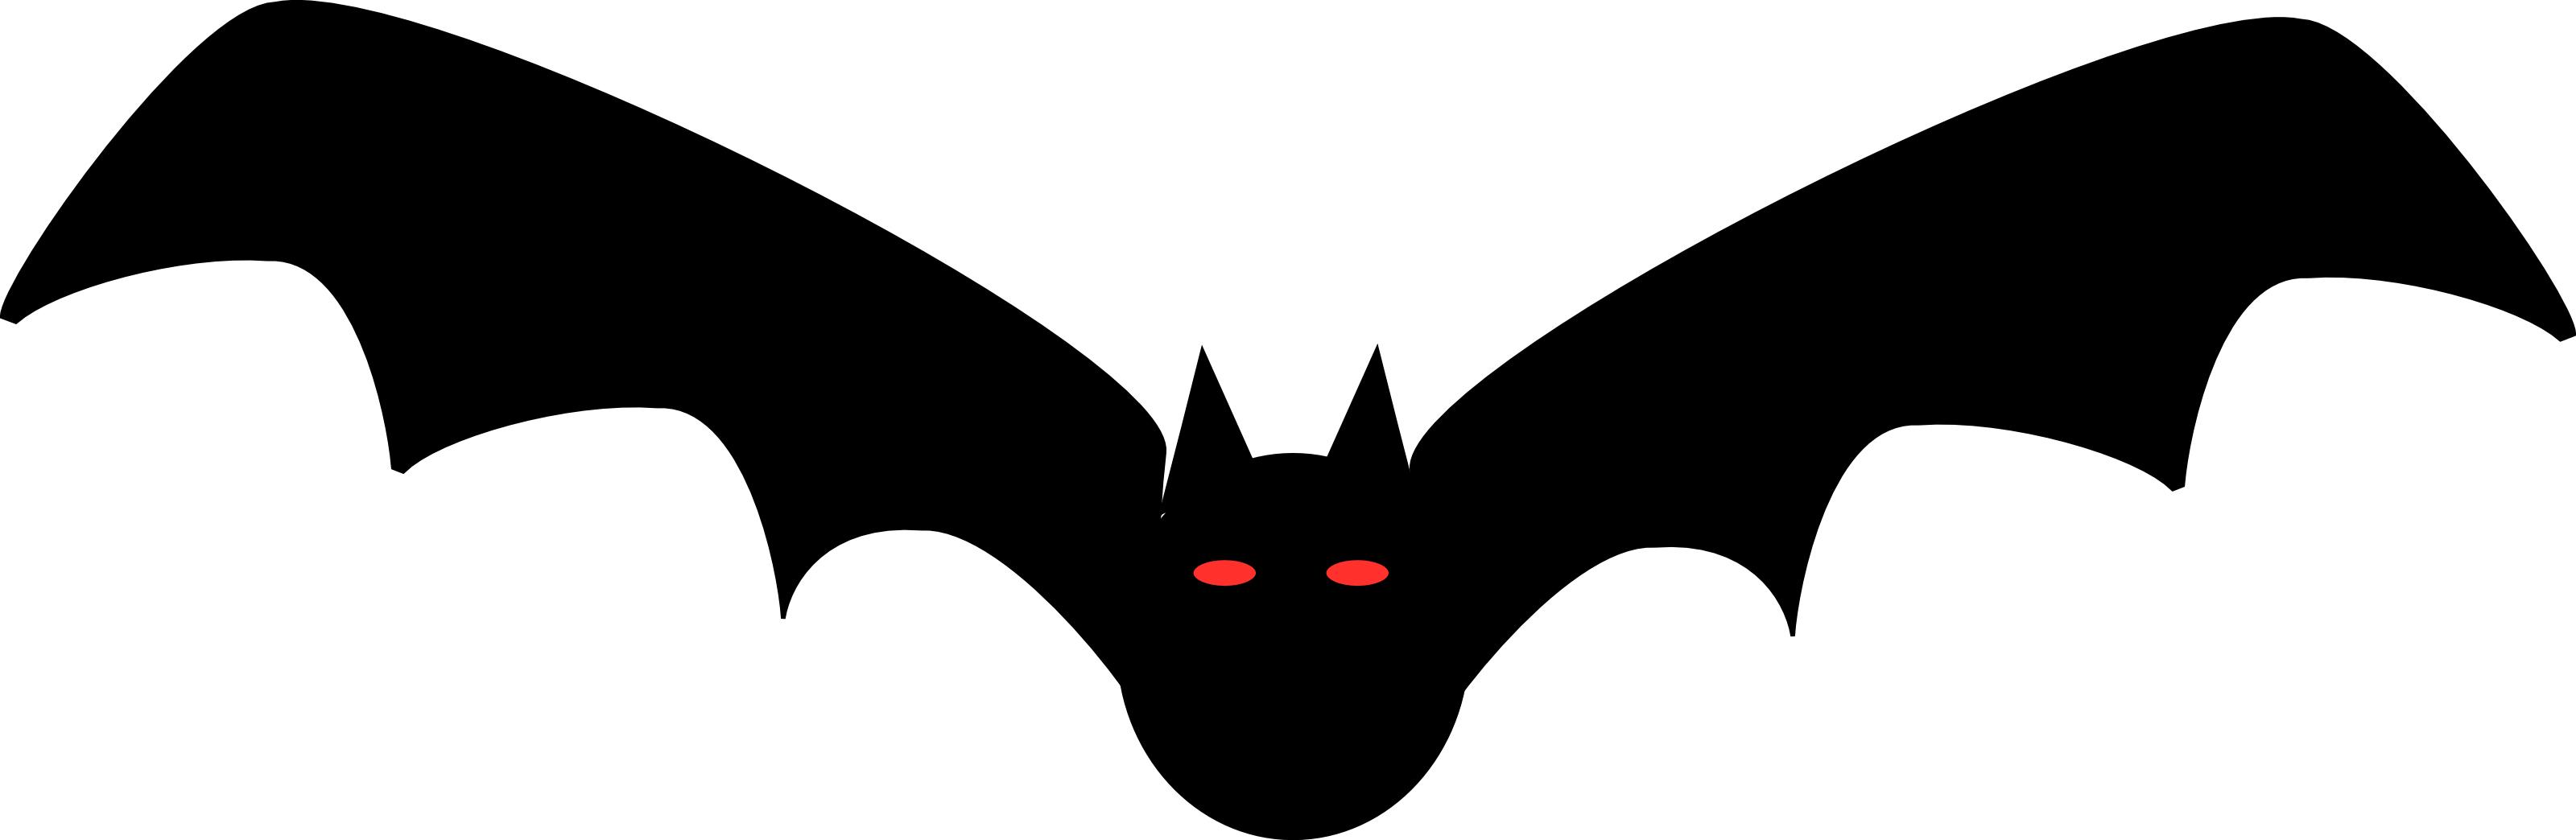 A Picture Of A Cartoon Bat free cartoon bat pictures, download free clip art, free clip